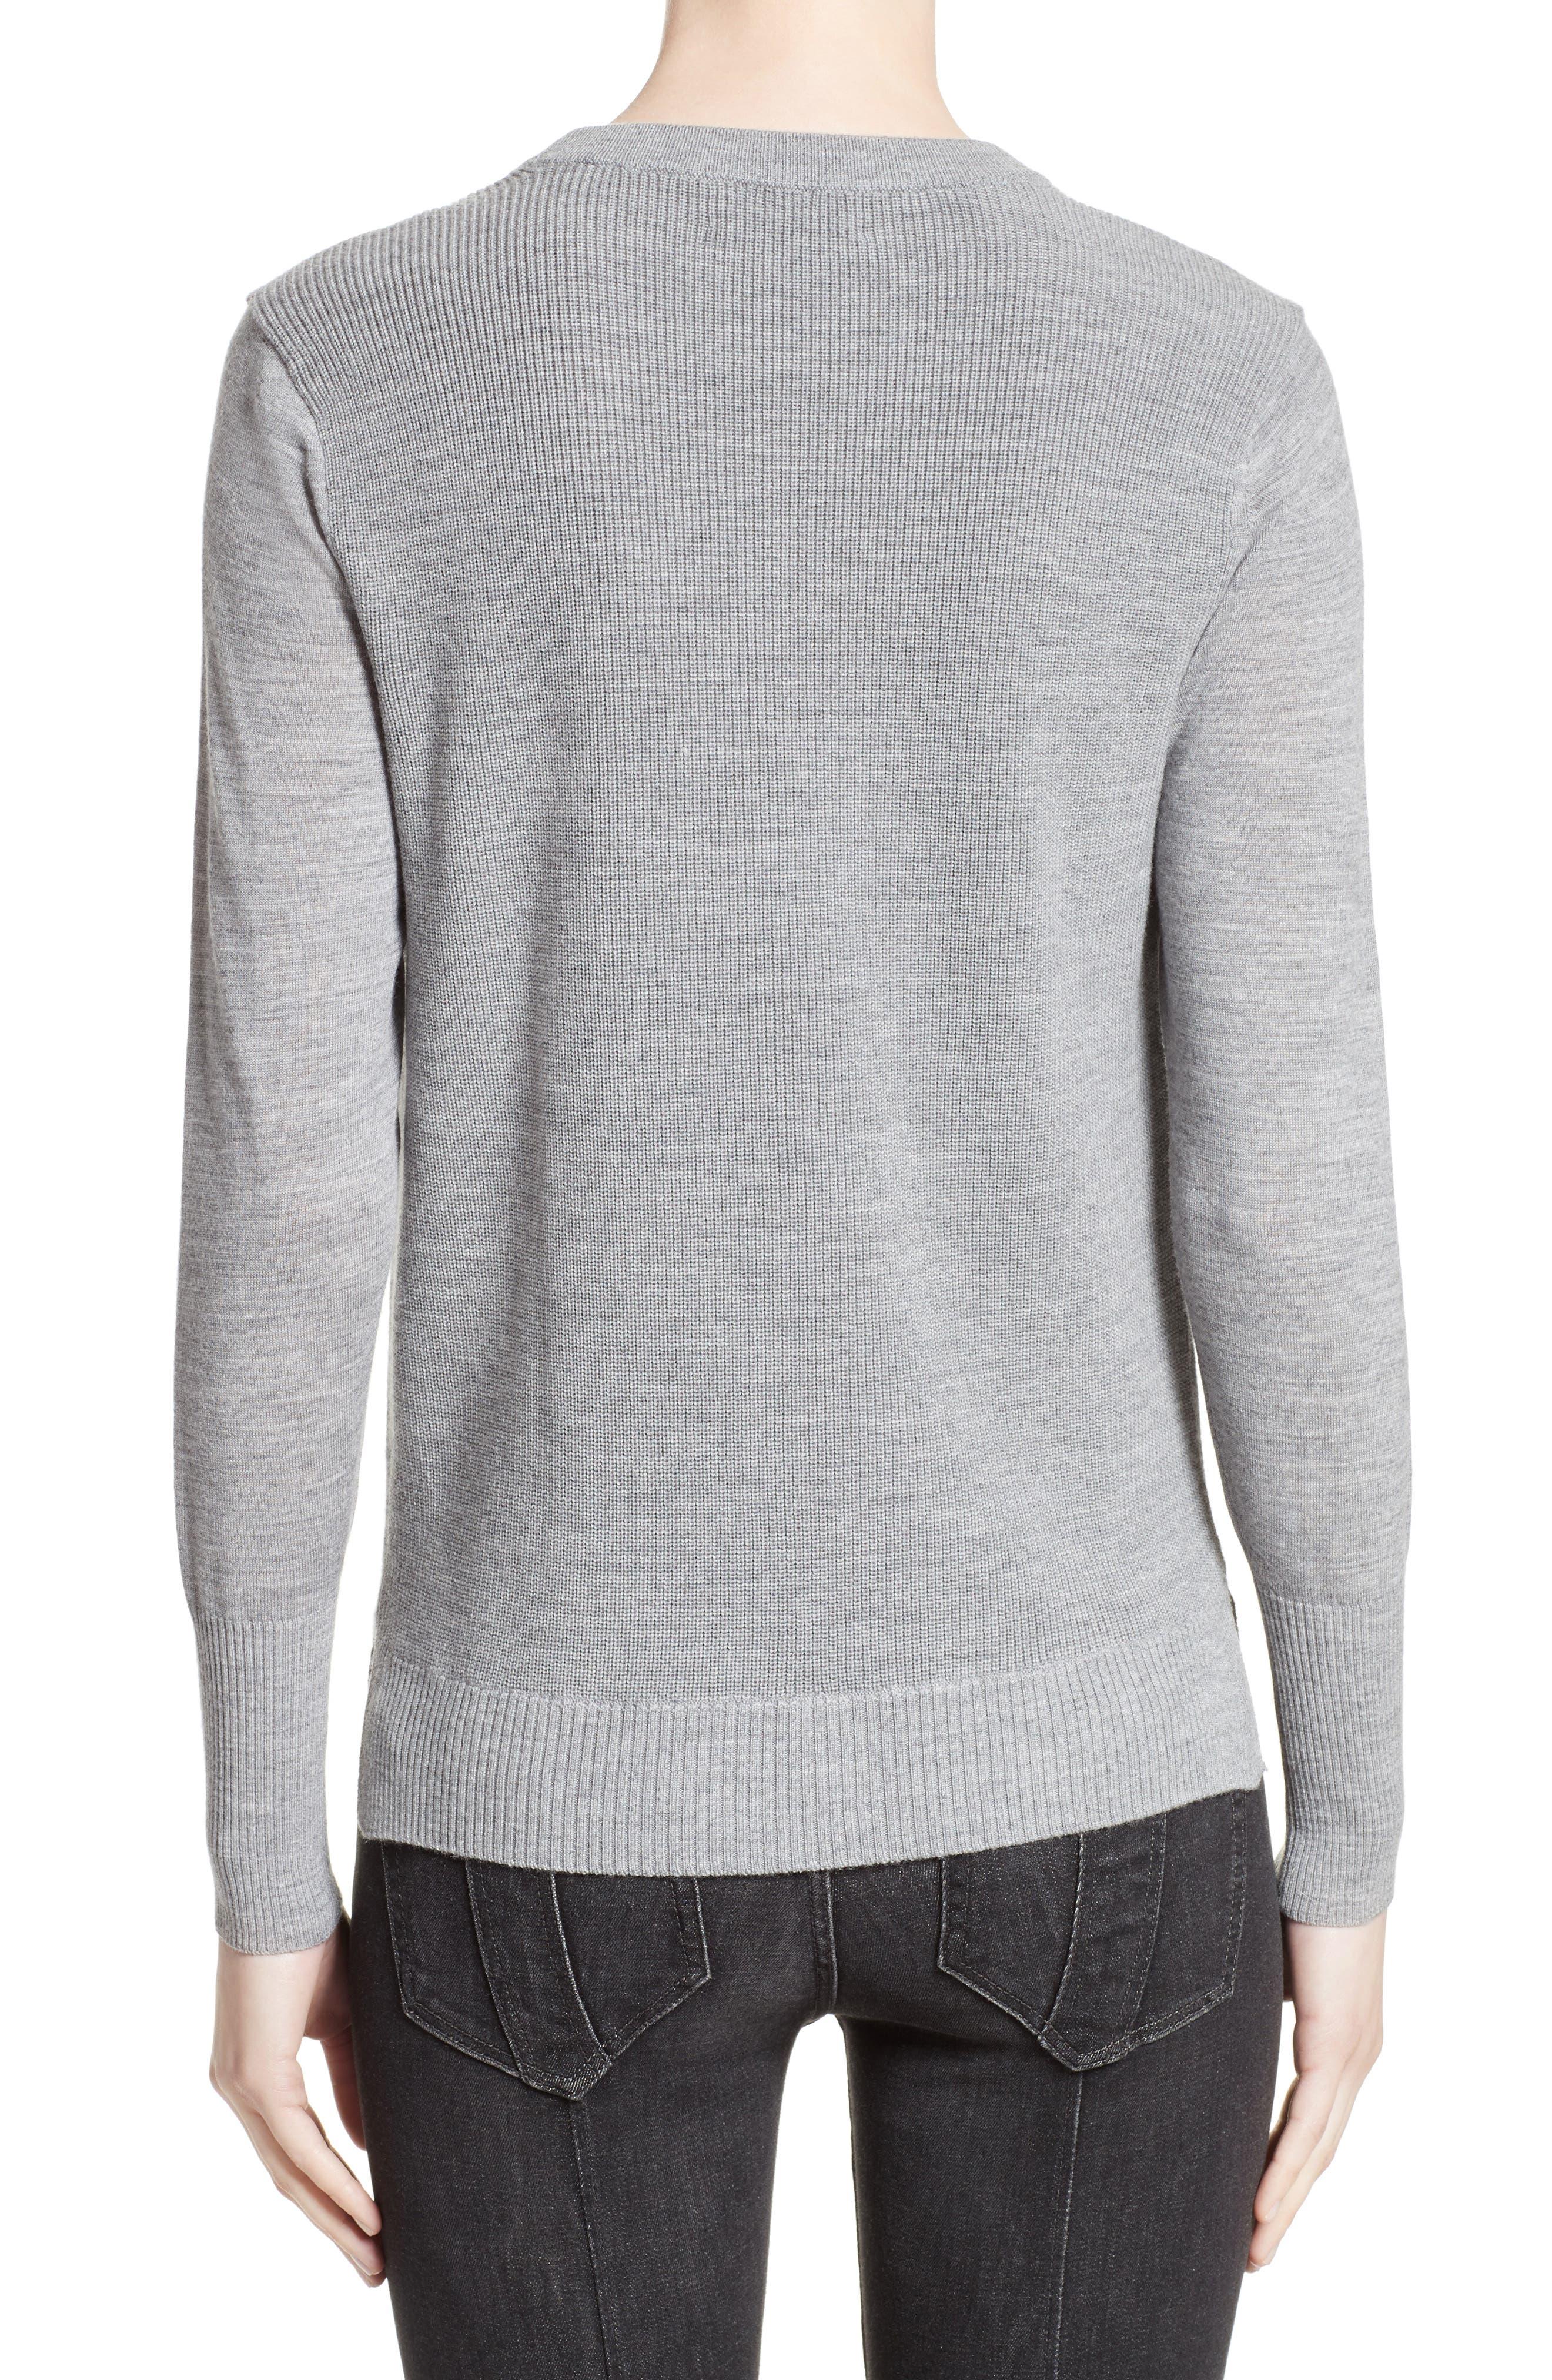 Meigan Merino Wool Sweater,                             Alternate thumbnail 4, color,